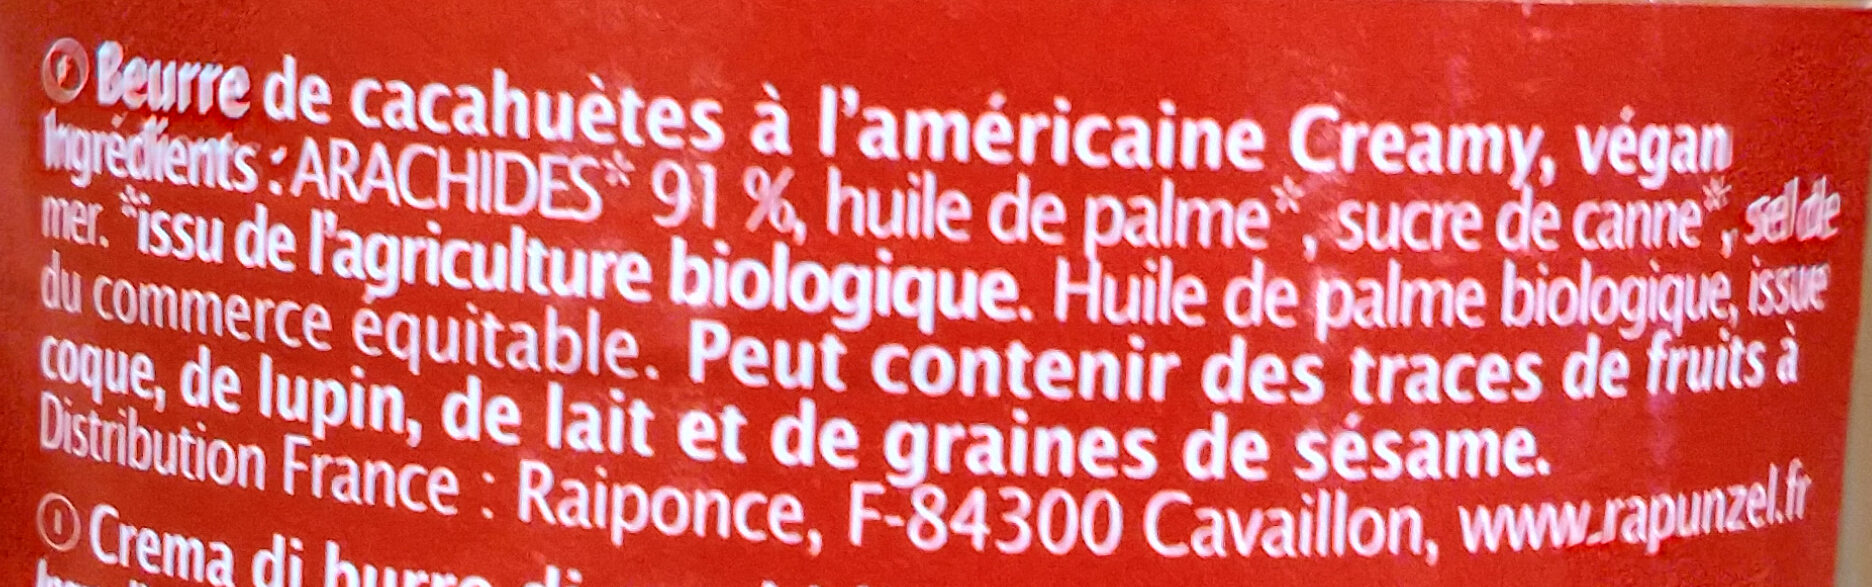 Original Peanutbutter Creamy - Ingrédients - fr